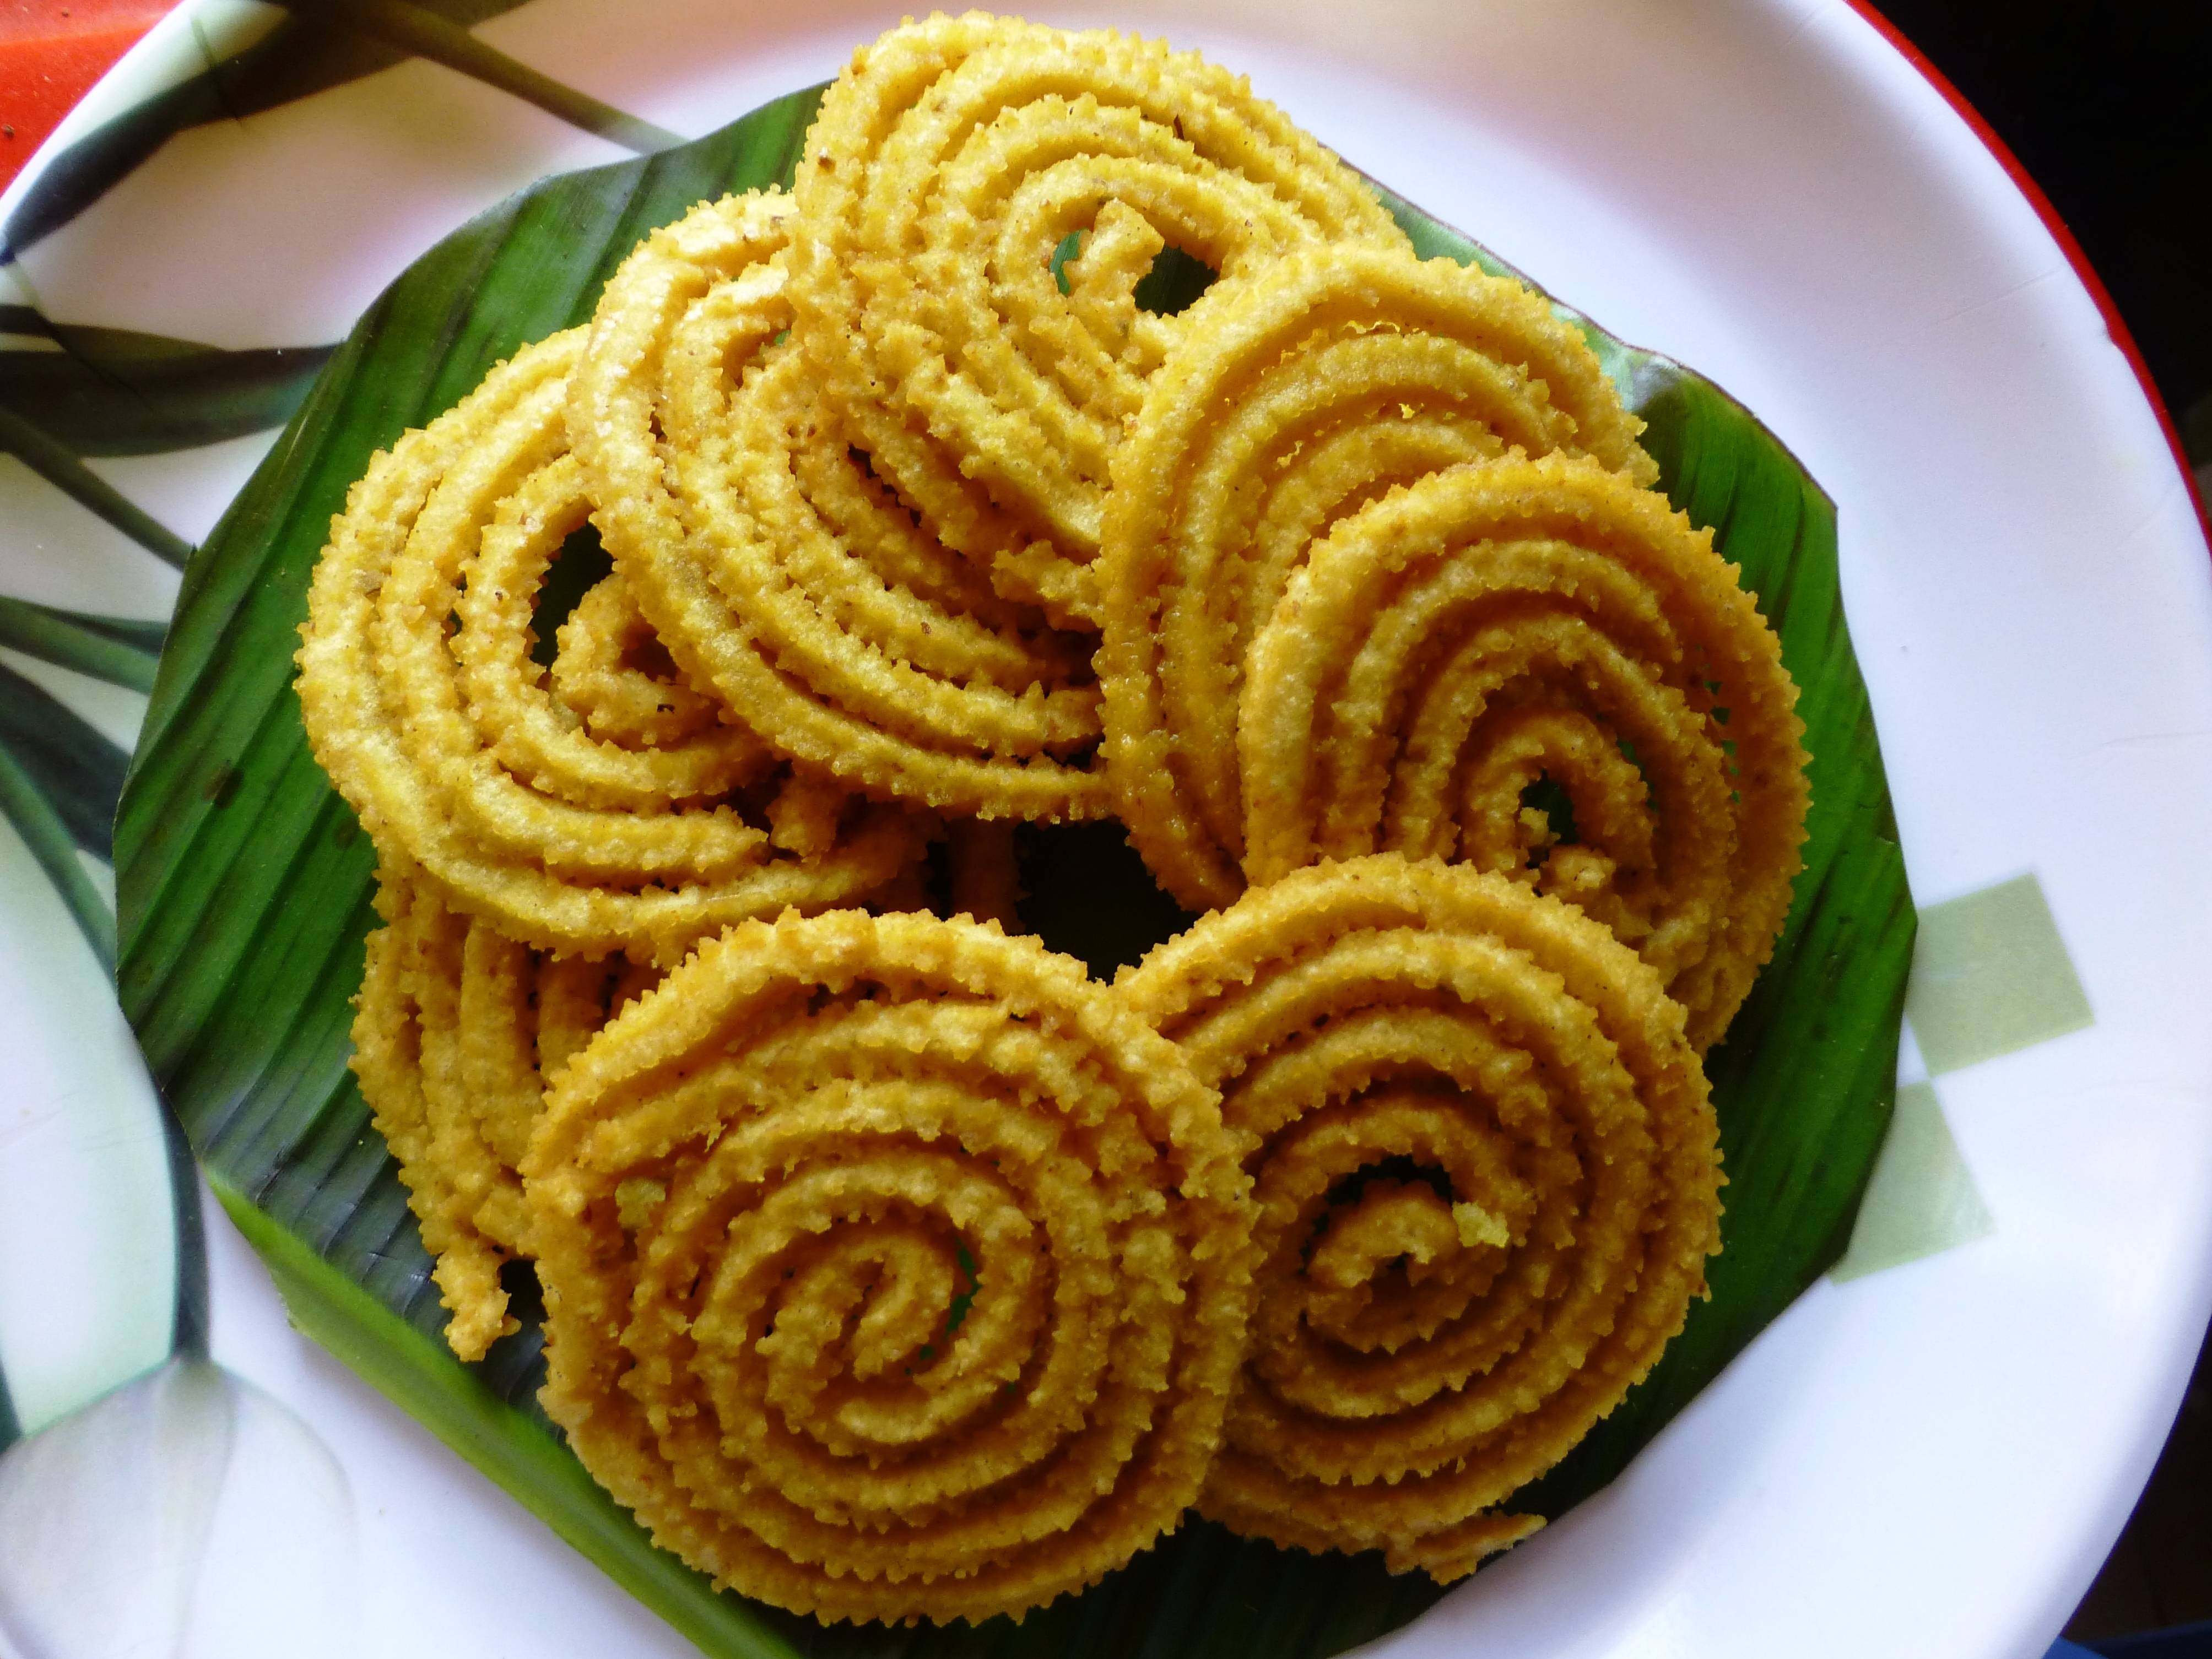 Murukku : Savory And Crunchy Twists Made From Rice Flour